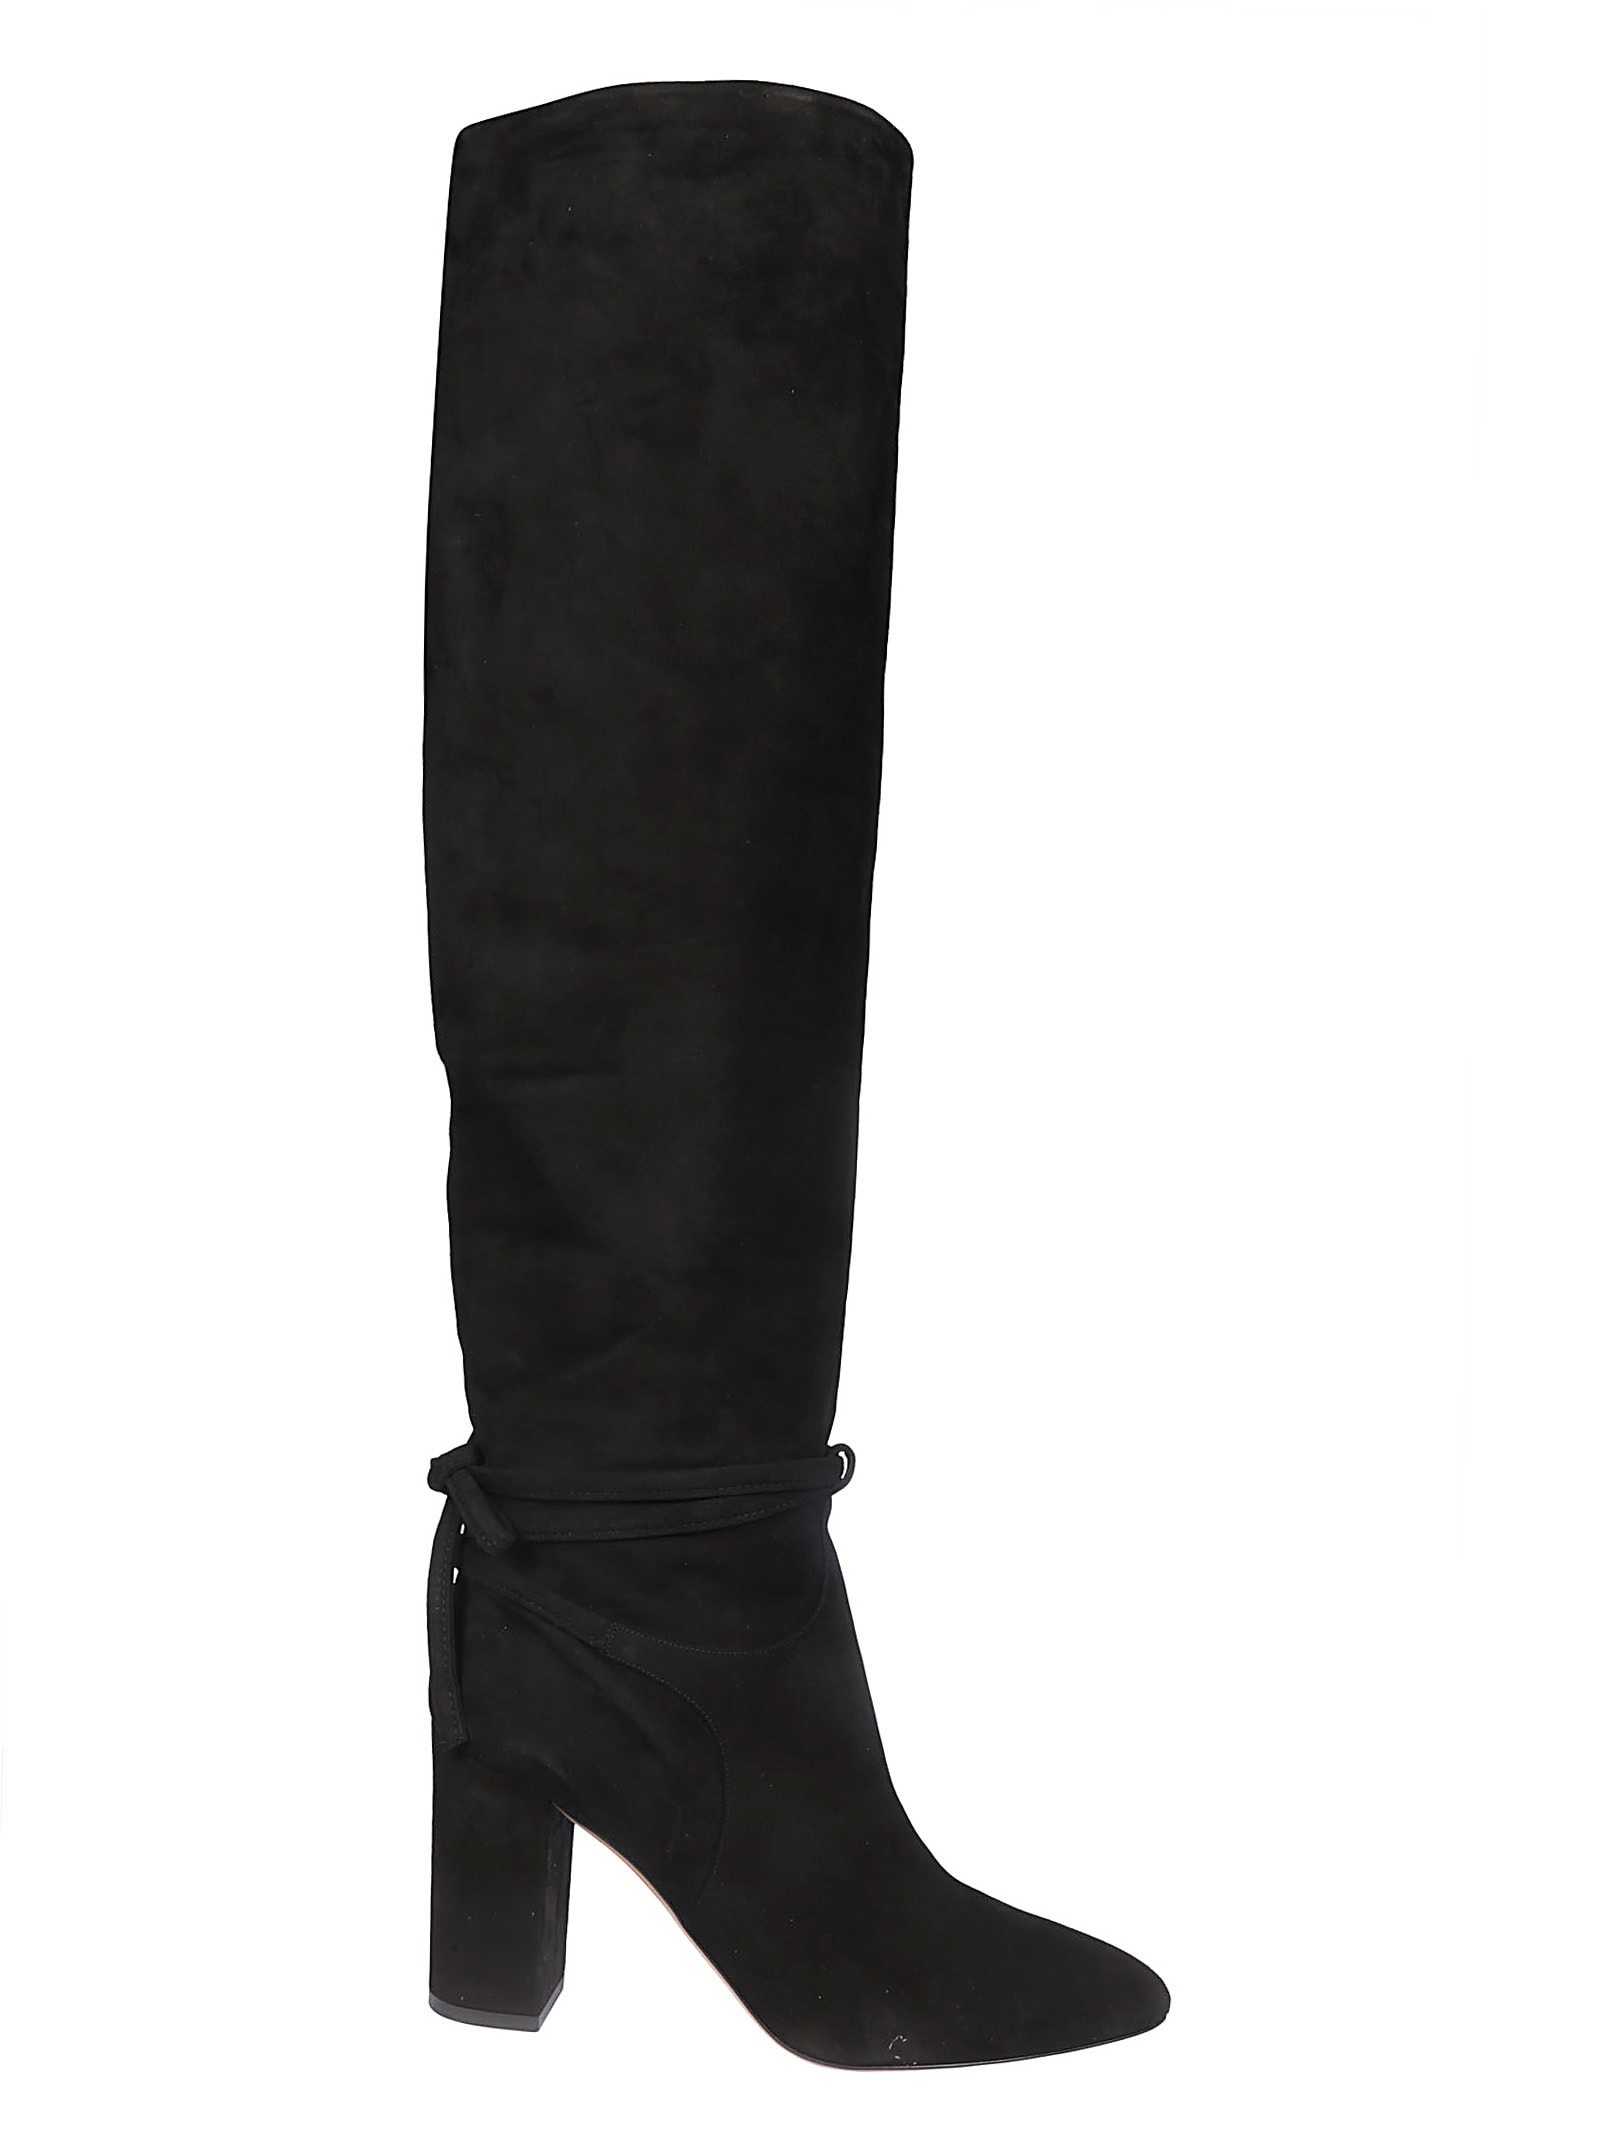 Aquazzura All I Need Over the Knee Boots | SHOPBOP SAVE UP